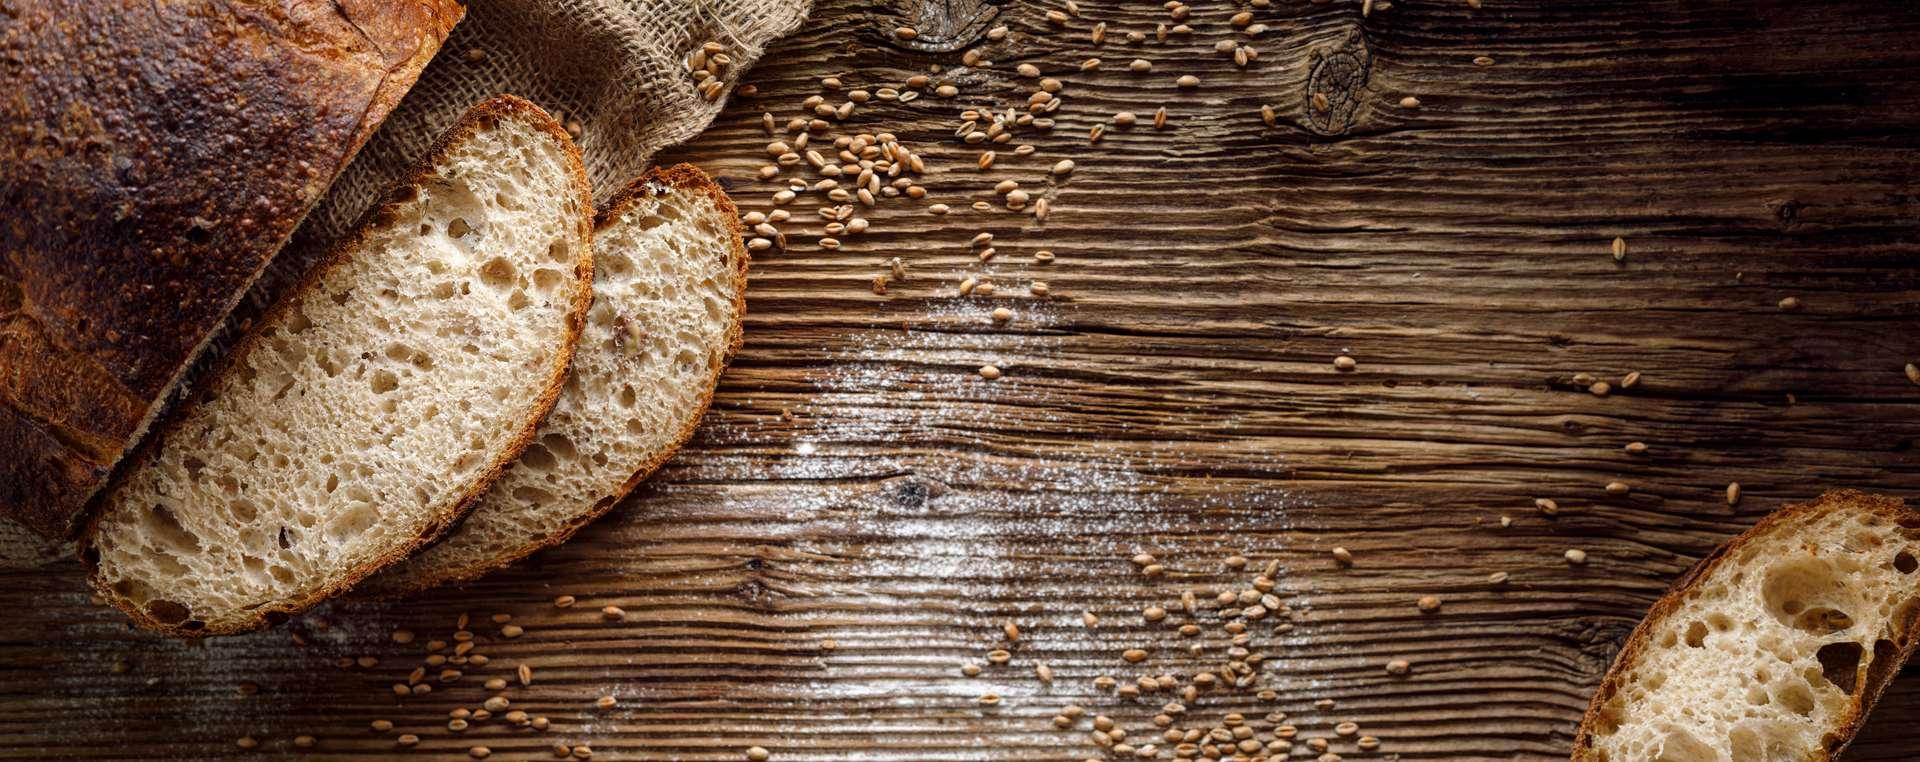 Lower Carb Brot: Was macht es so besonders?